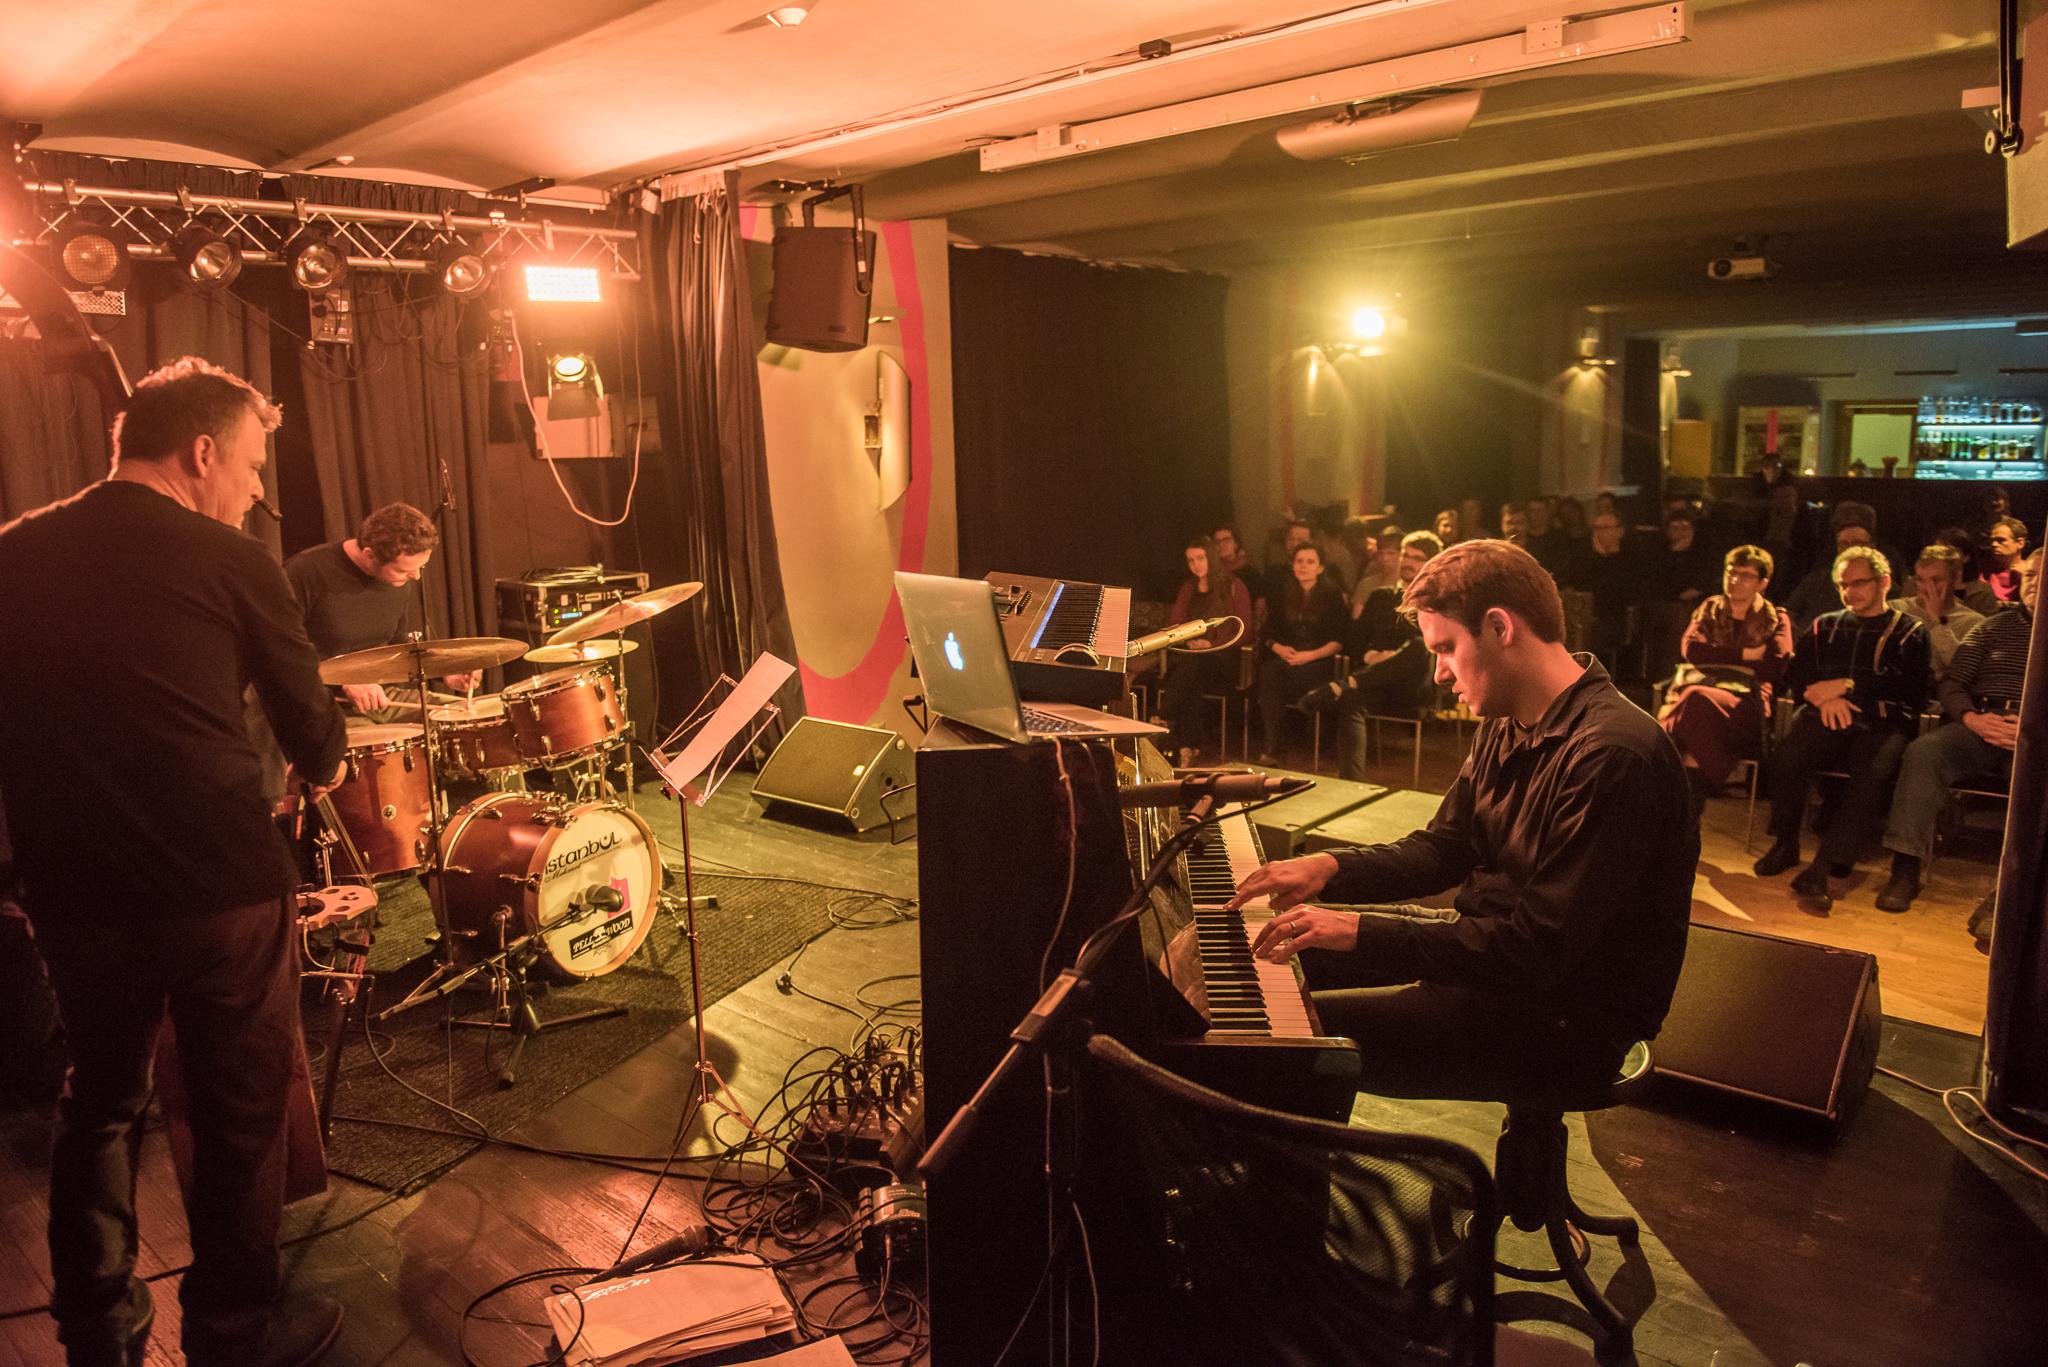 koncert ROBERT BALZAR TRIO / 22. 2. 2018 // Klub Art